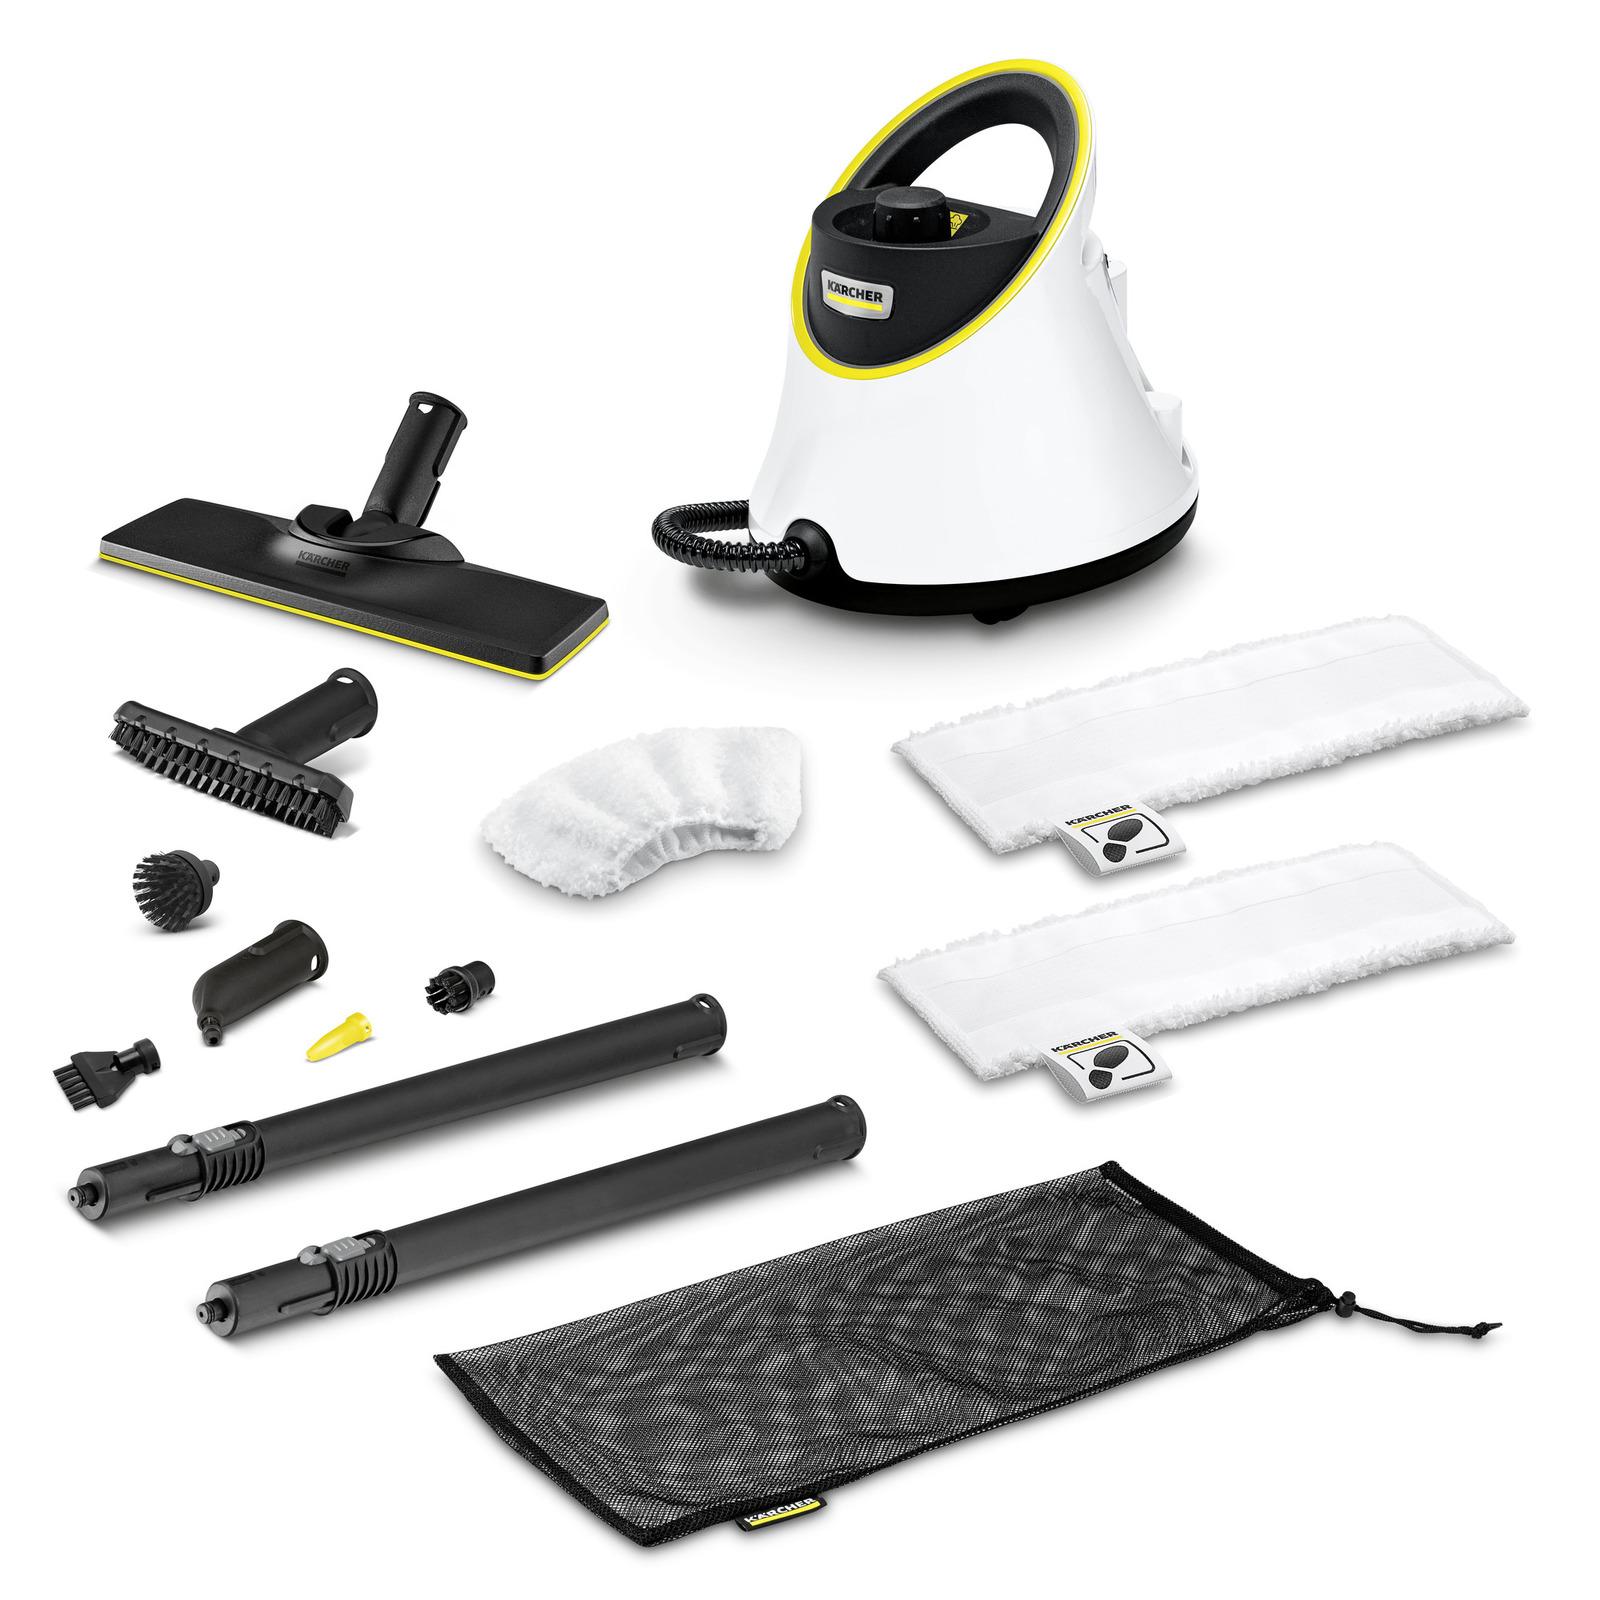 dampfreiniger sc 2 deluxe easyfix premium k rcher. Black Bedroom Furniture Sets. Home Design Ideas